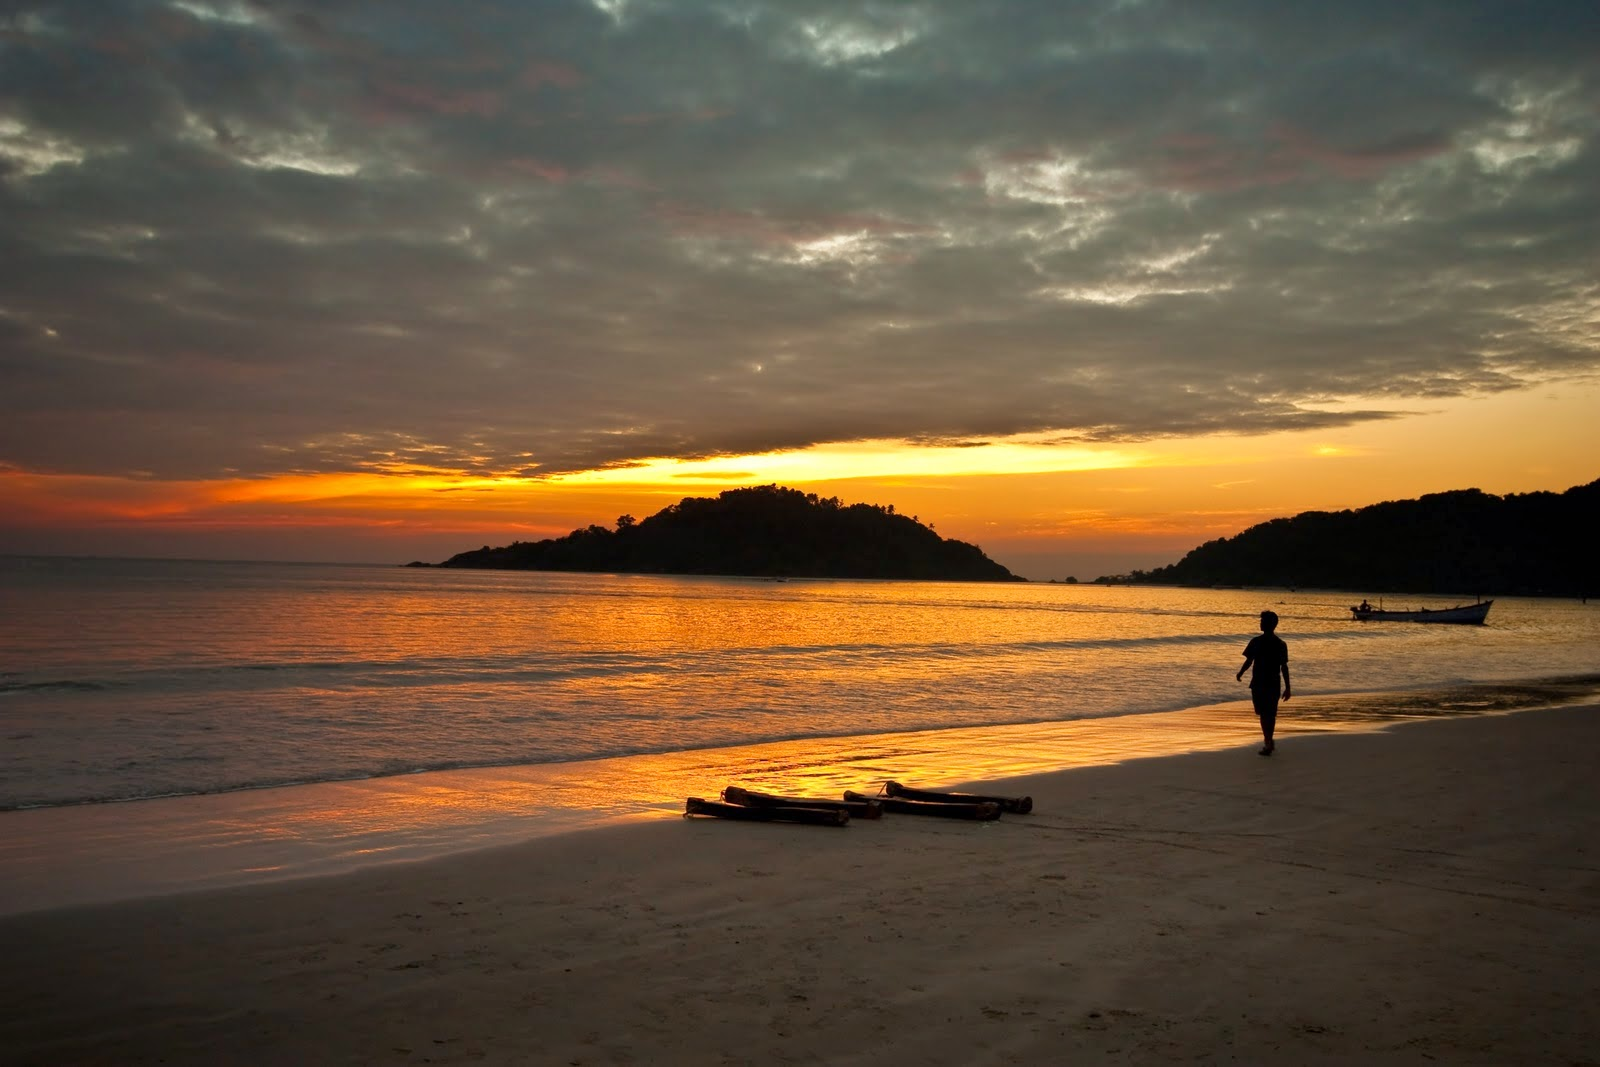 Drawn sunrise kerala scenery Beach the in points Palolem